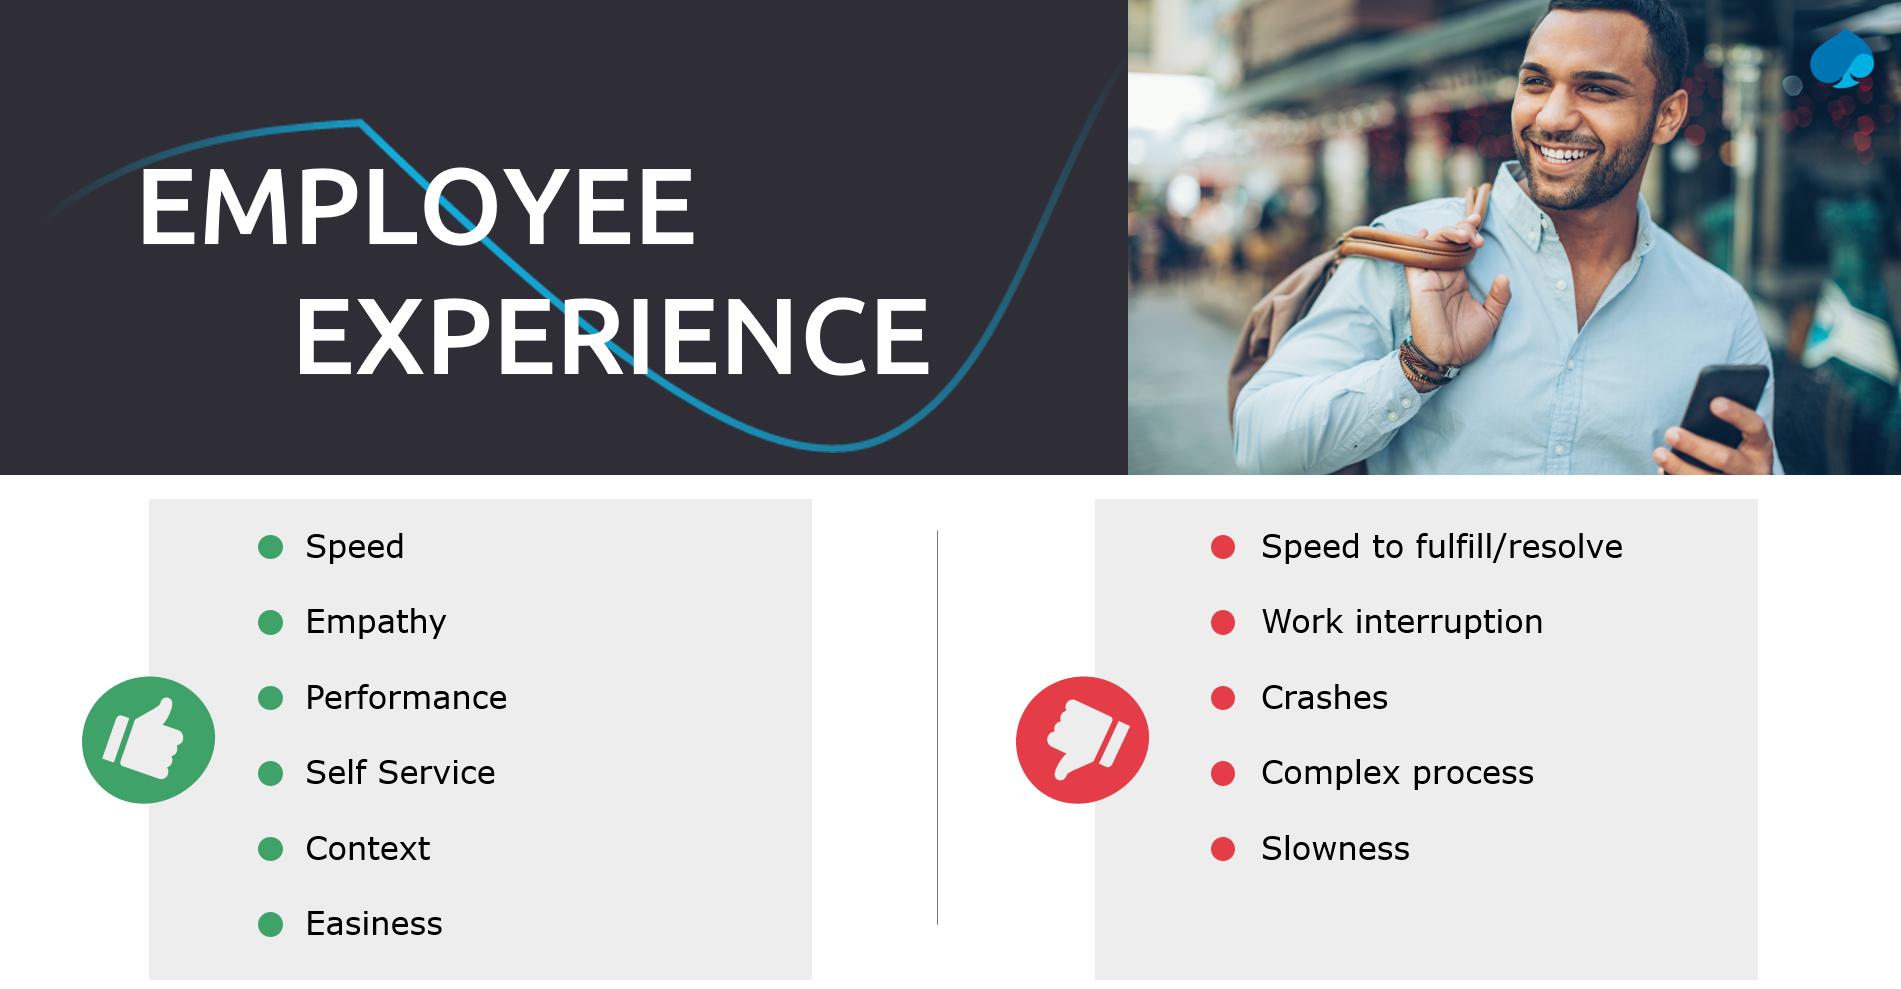 Employee-Experience-Blog-Arnaud-Bonneville